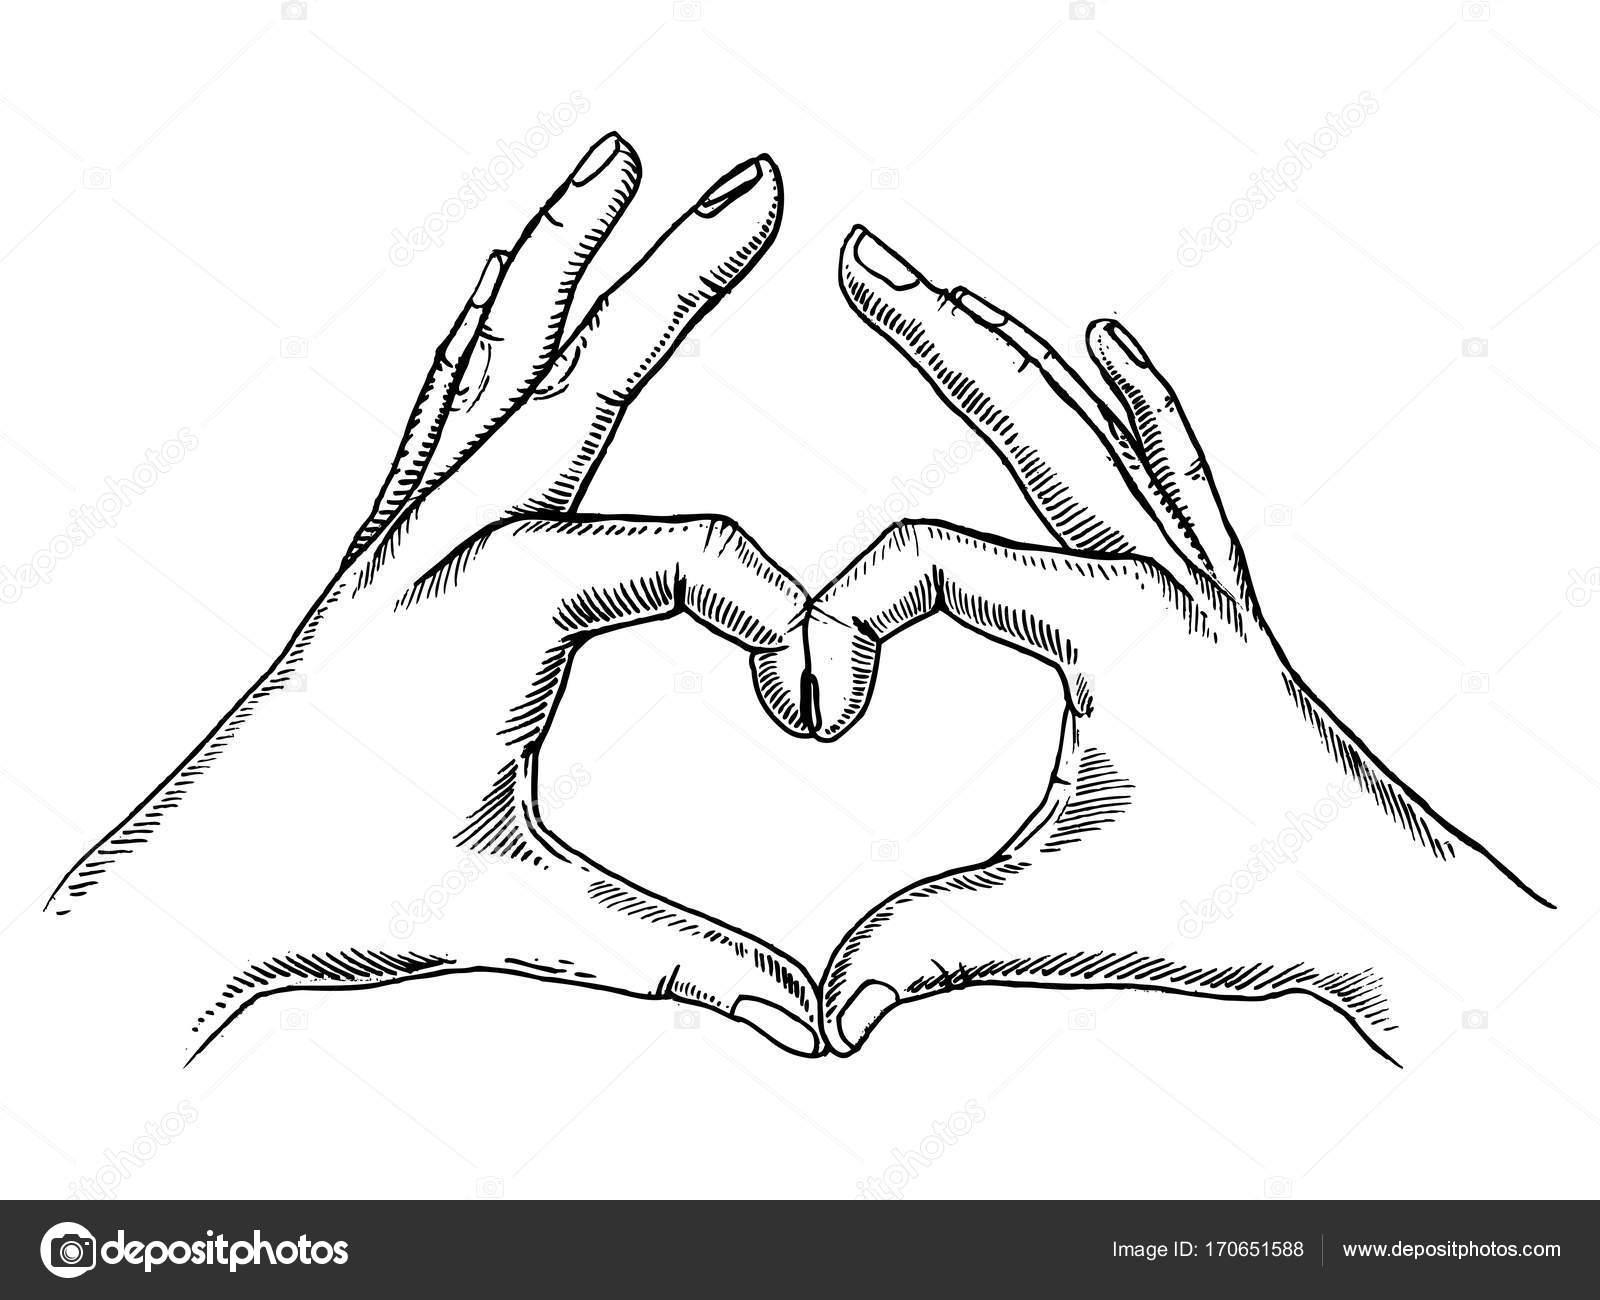 1600x1300 Hands Making Heart Sign Engraving Vector Stock Vector